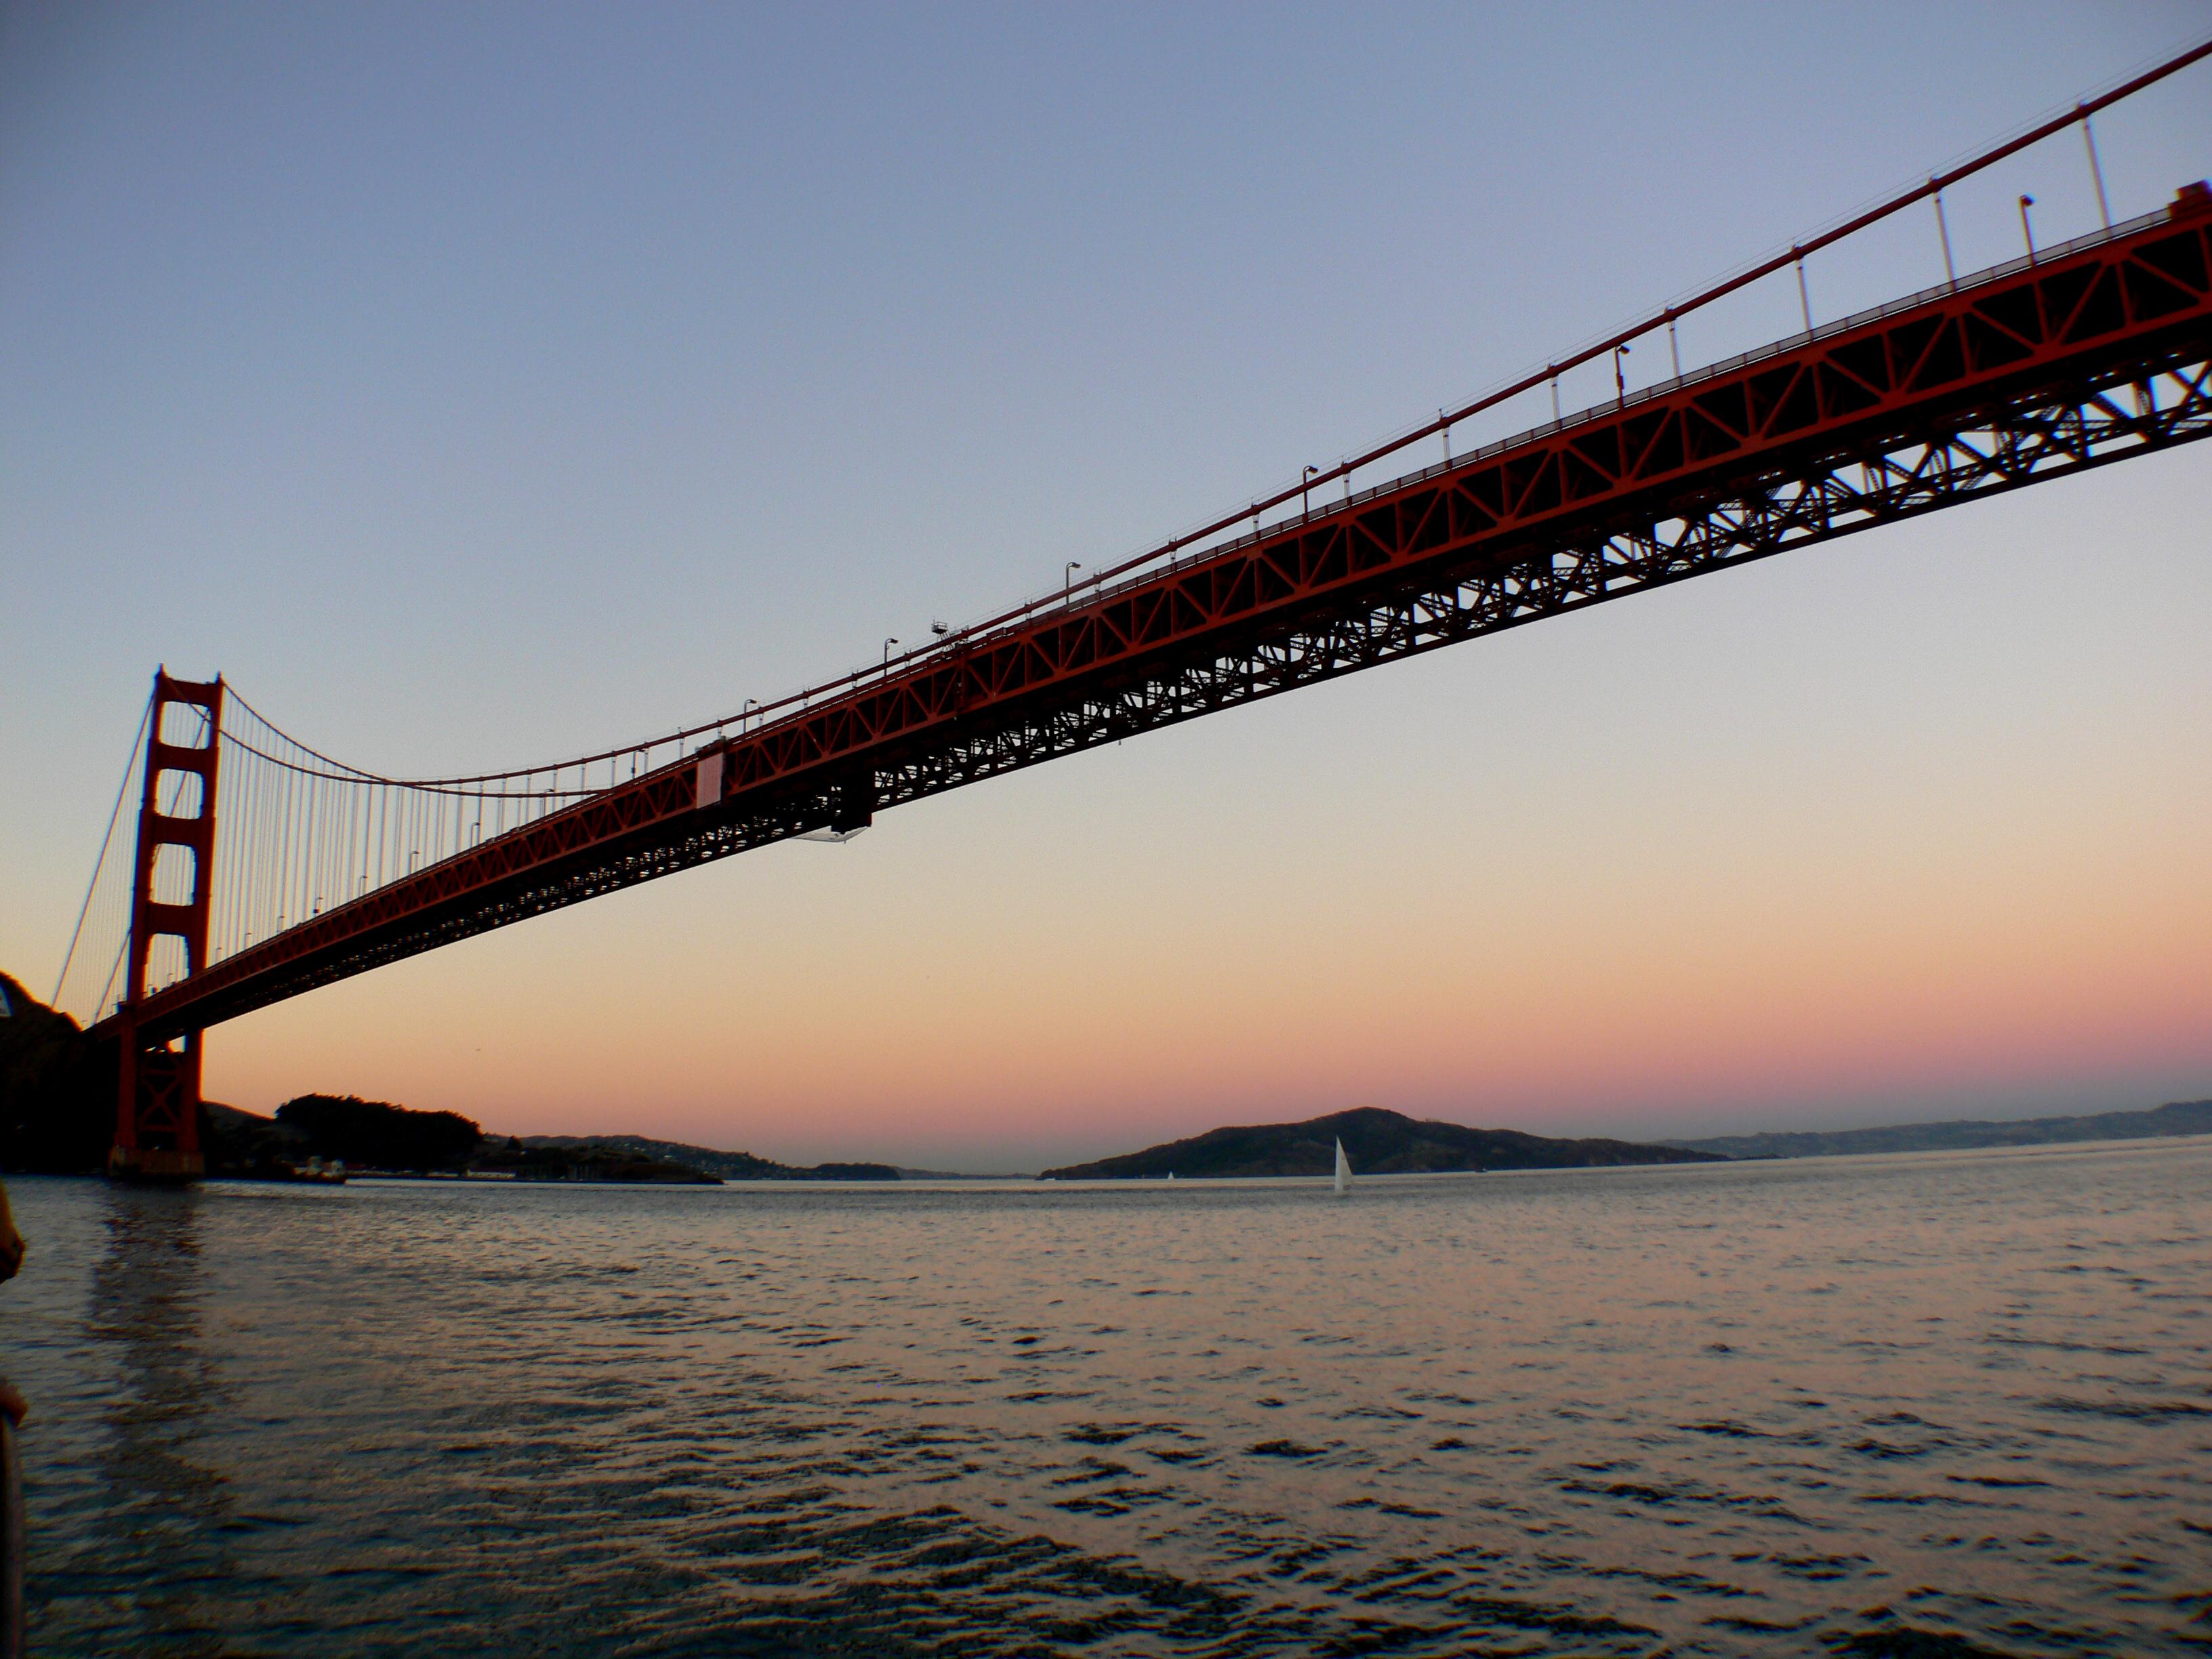 San Francisco Bay (27), Architecture, Bay, Bridge, Coast, HQ Photo